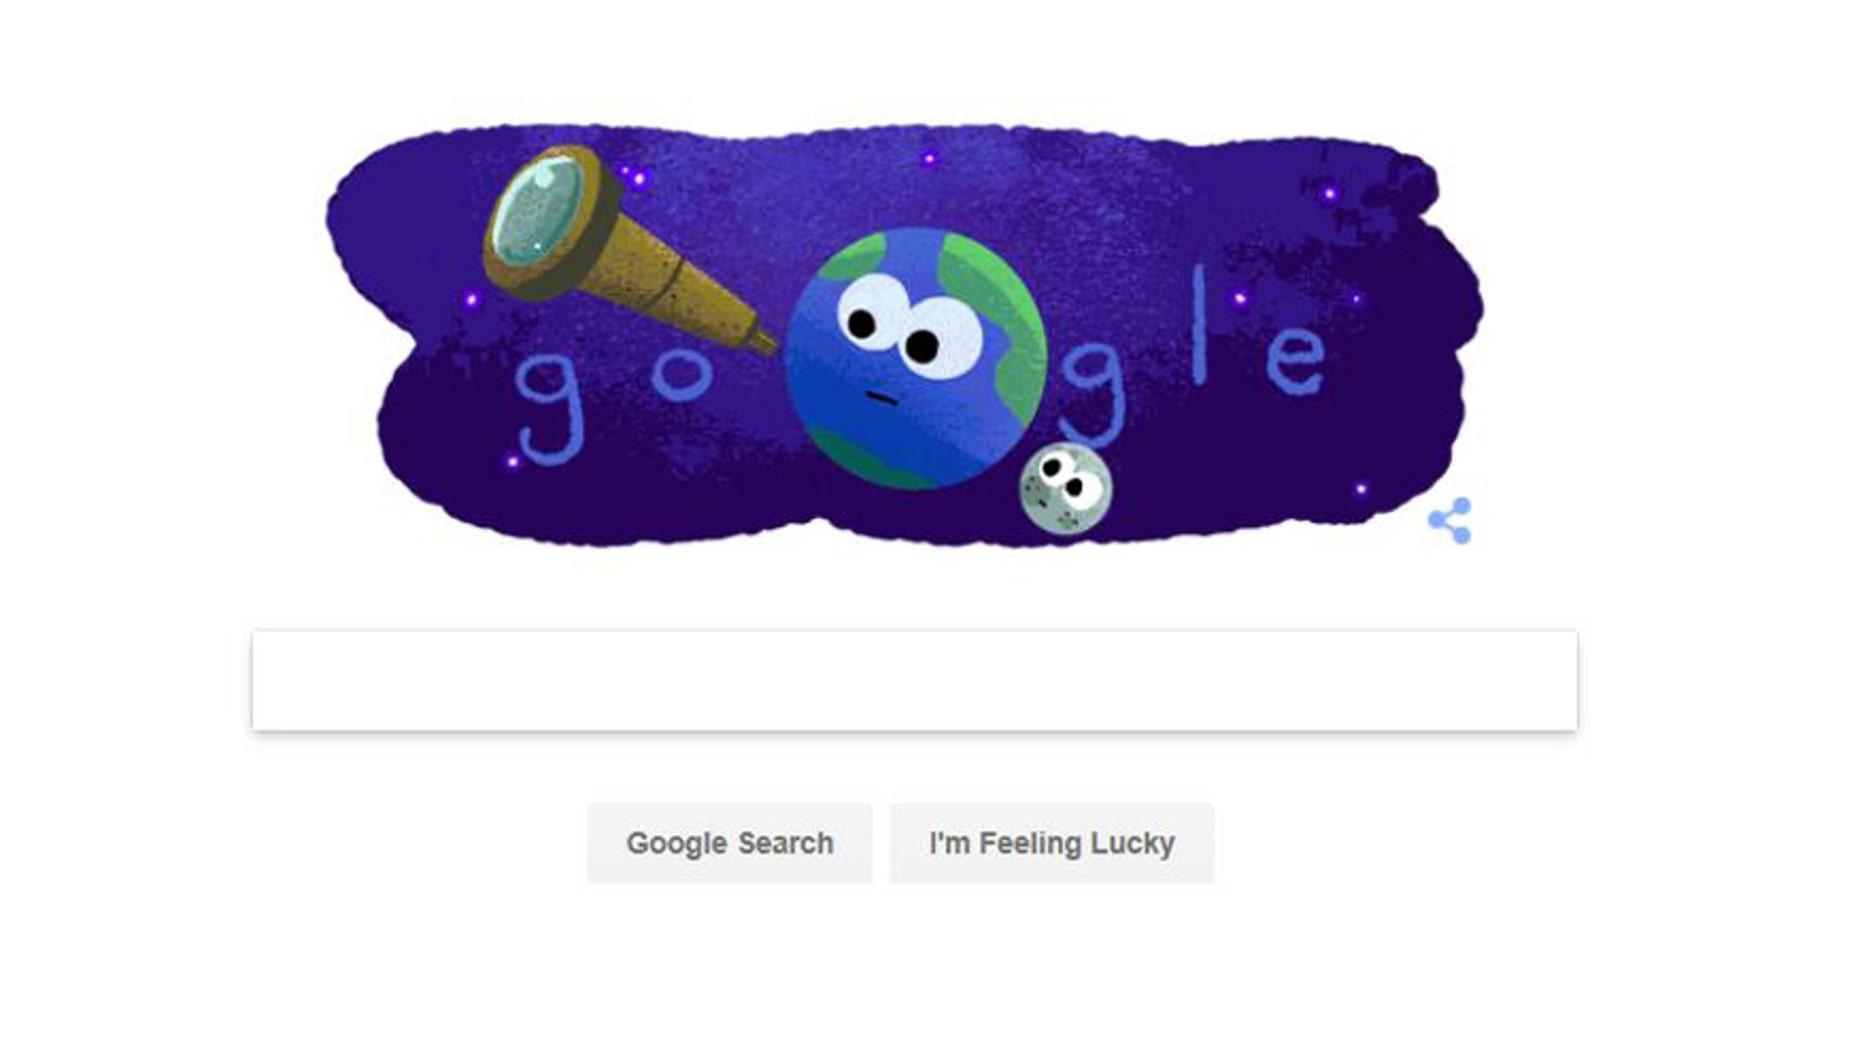 (Screenshot from www.google.com)